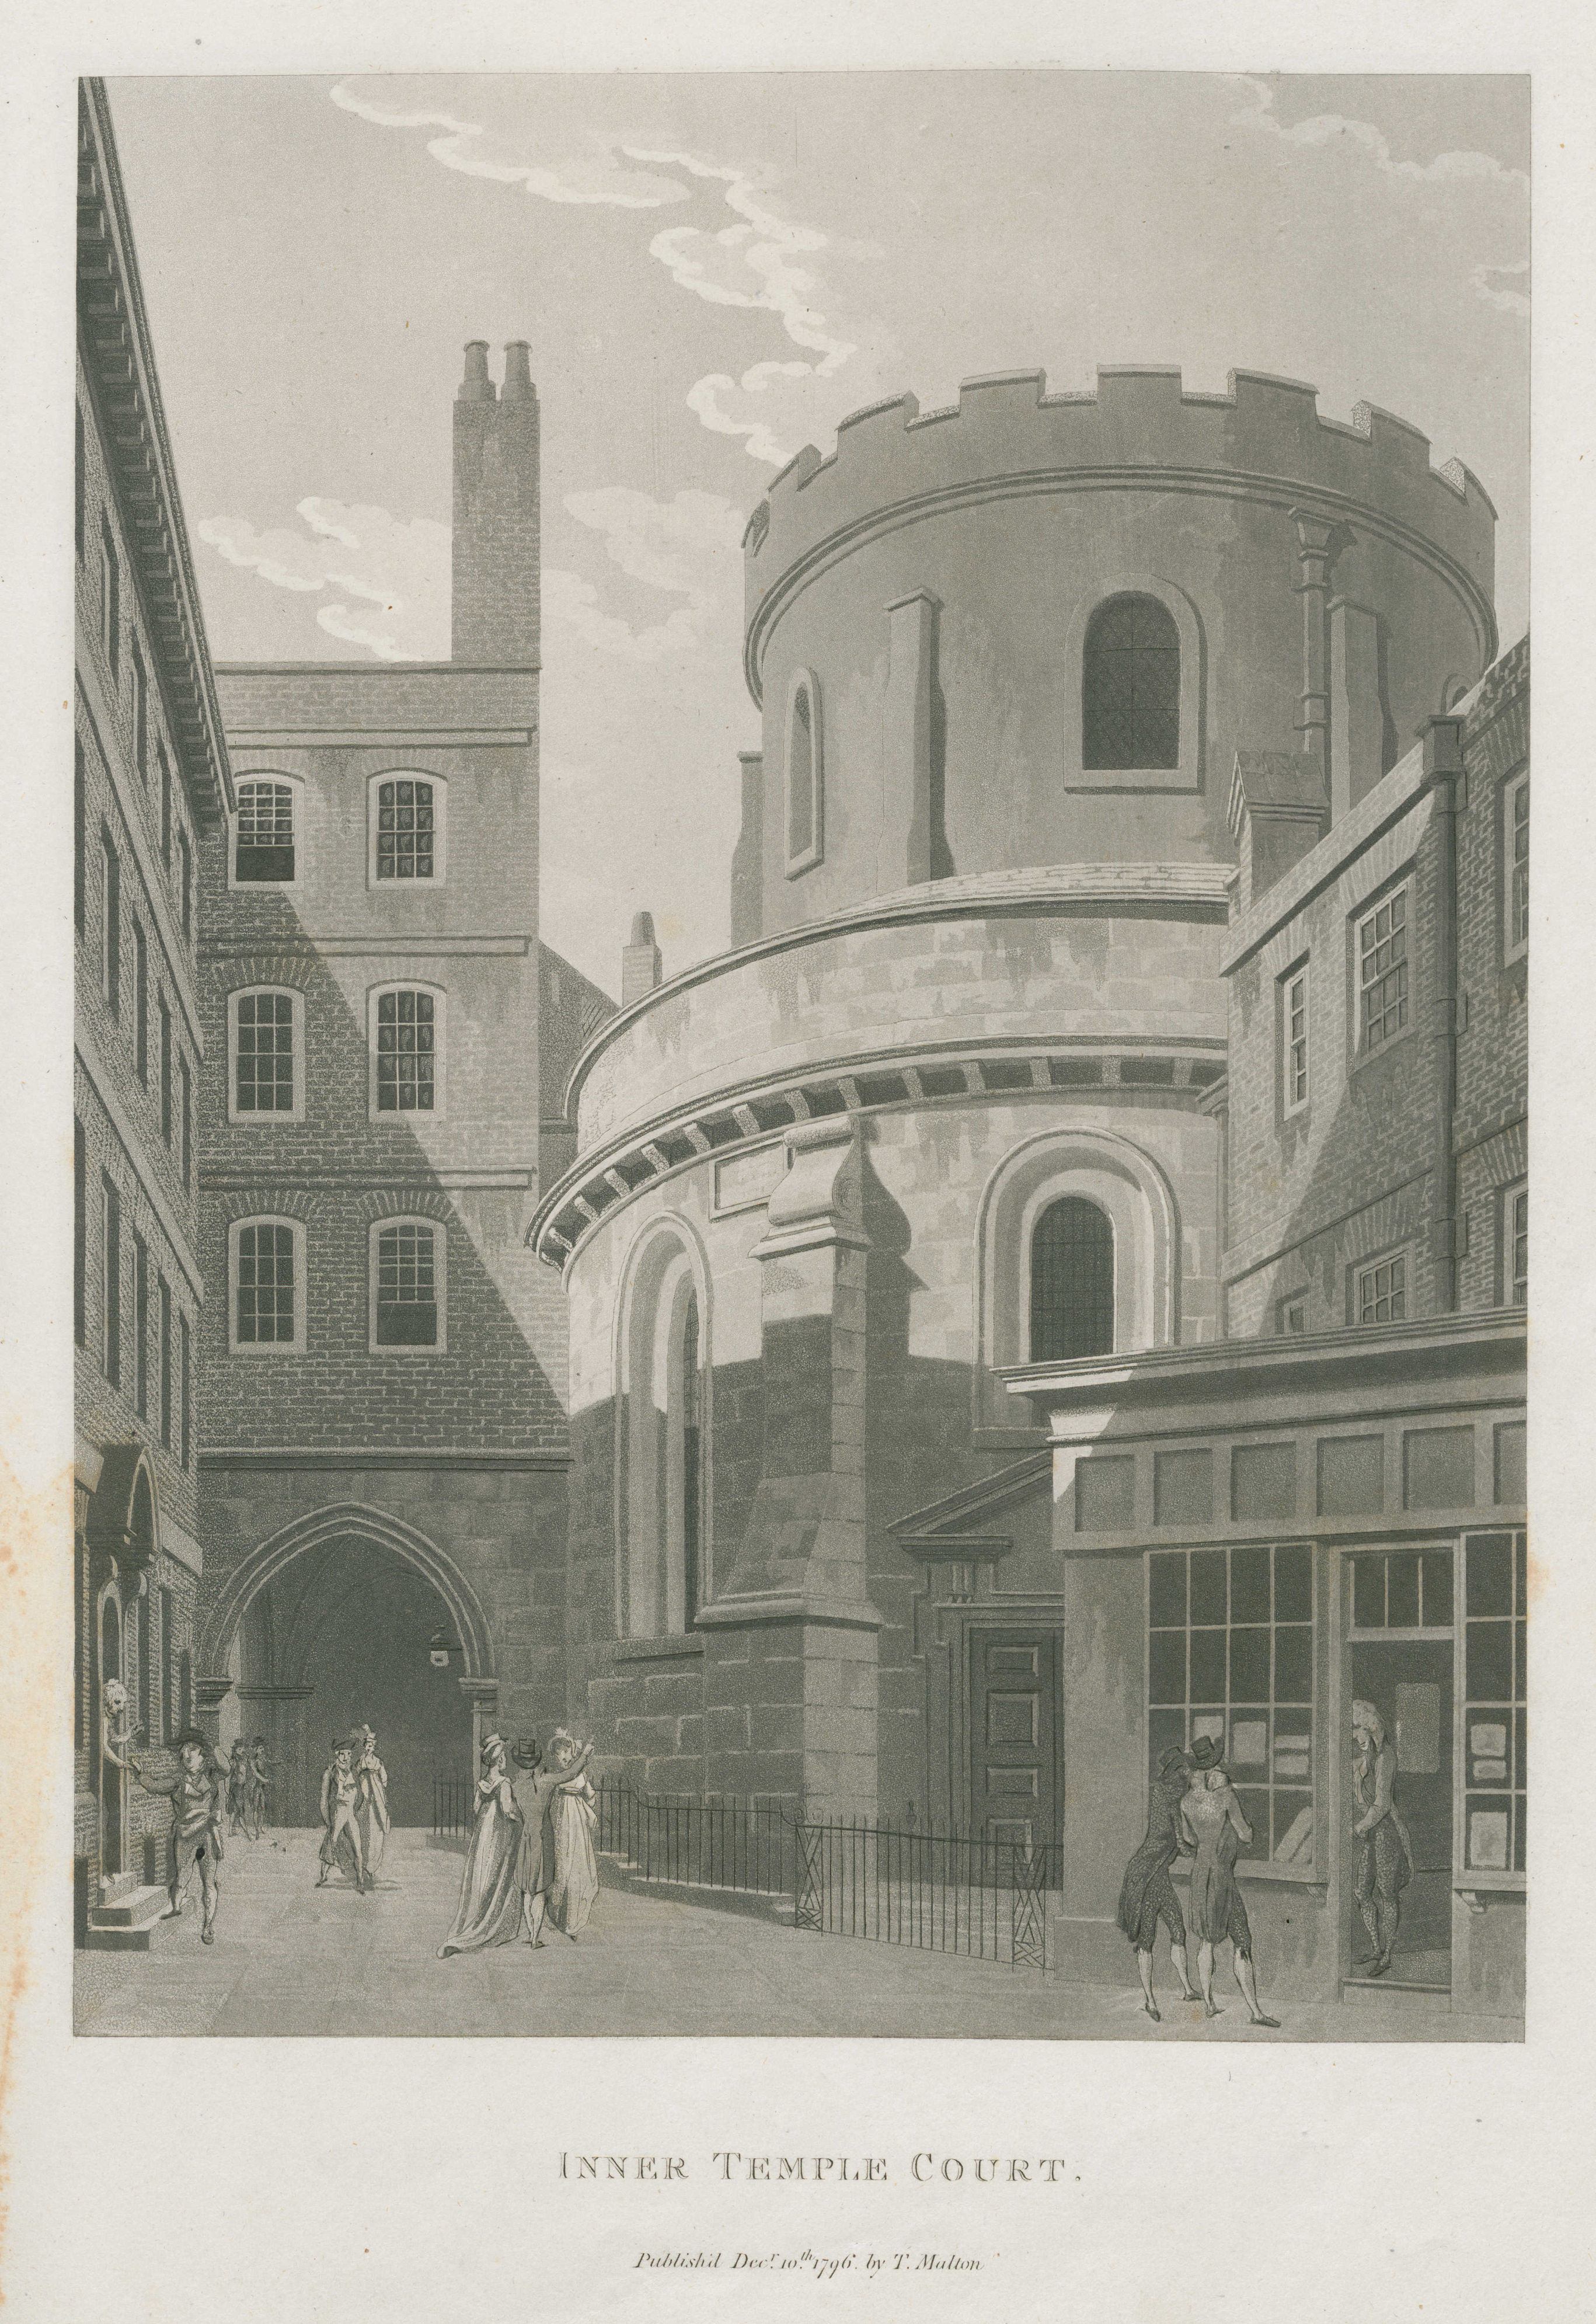 045 - Malton - Inner Temple Court